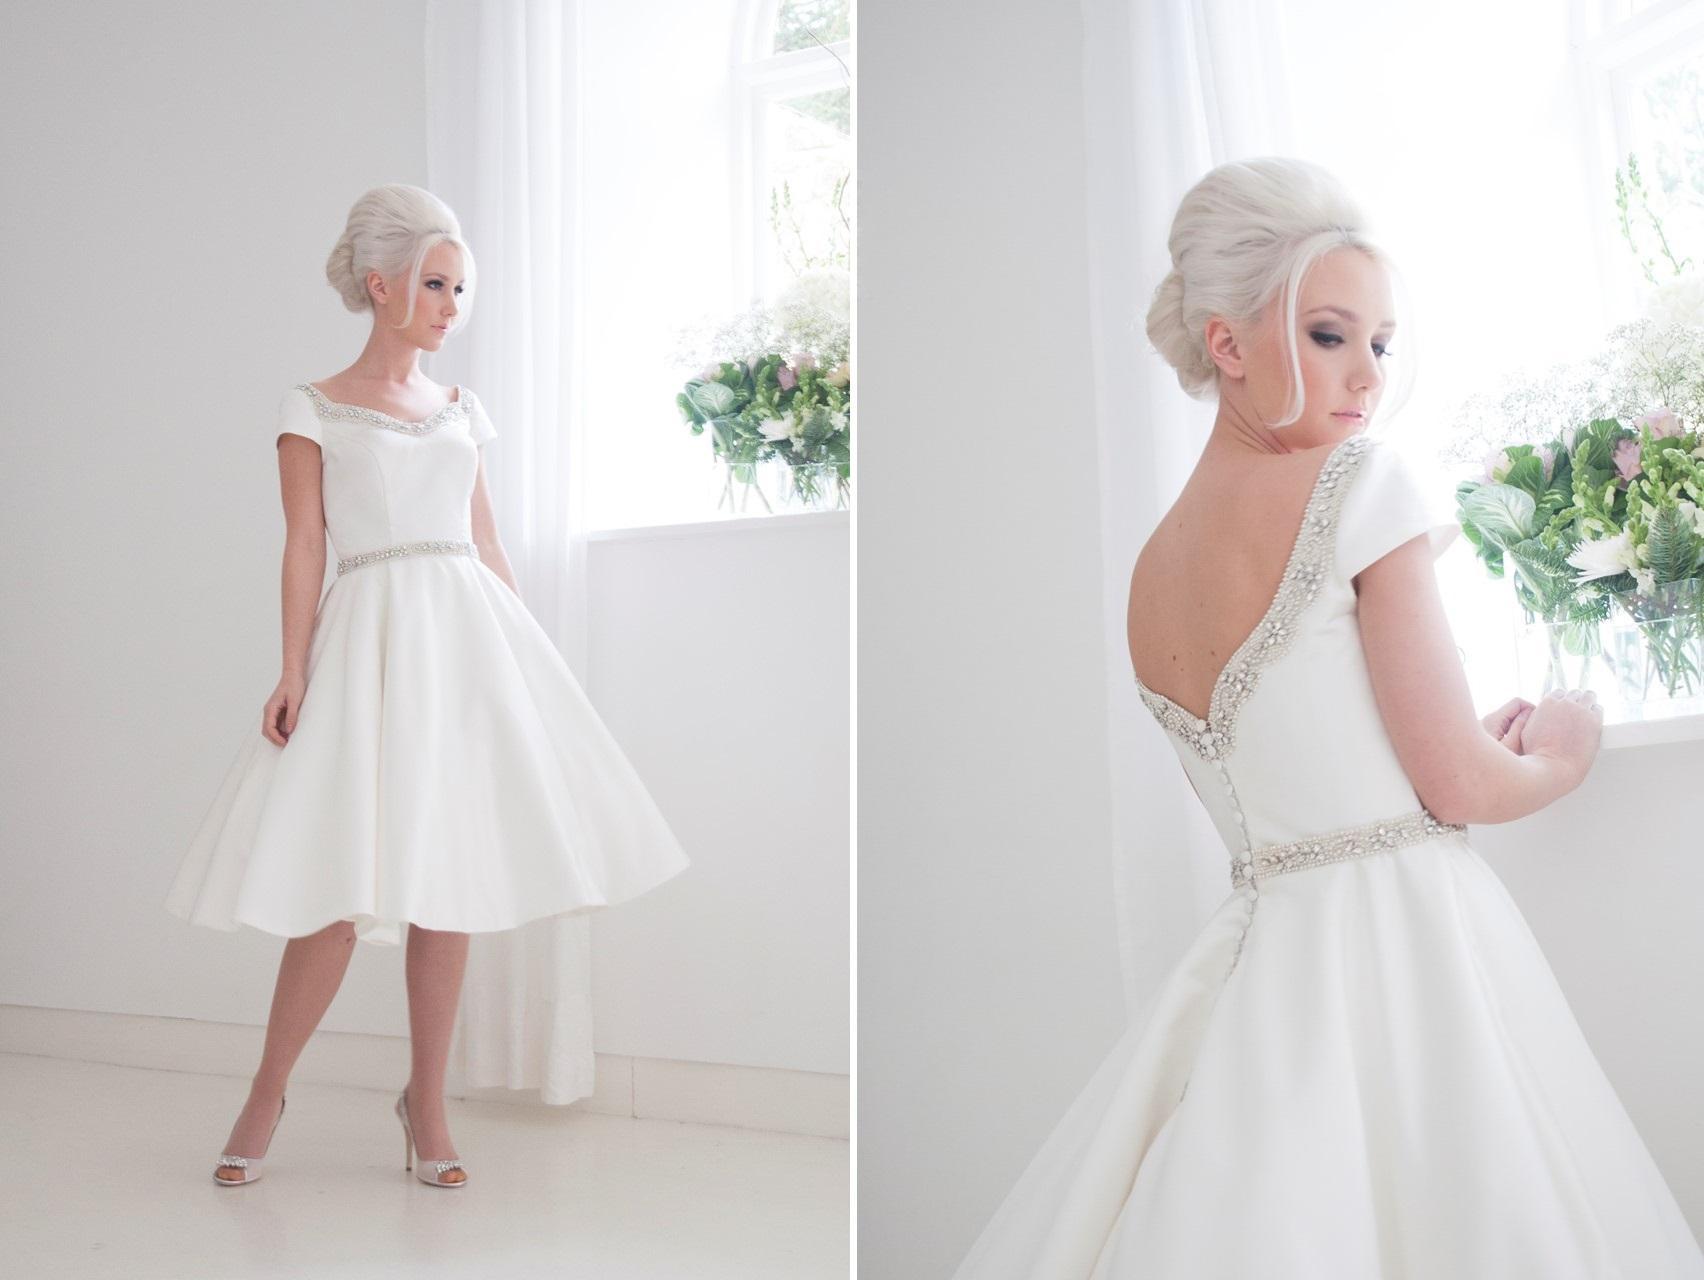 Vintage Wedding Dresses 1950s Capped Sleeves Short Brides